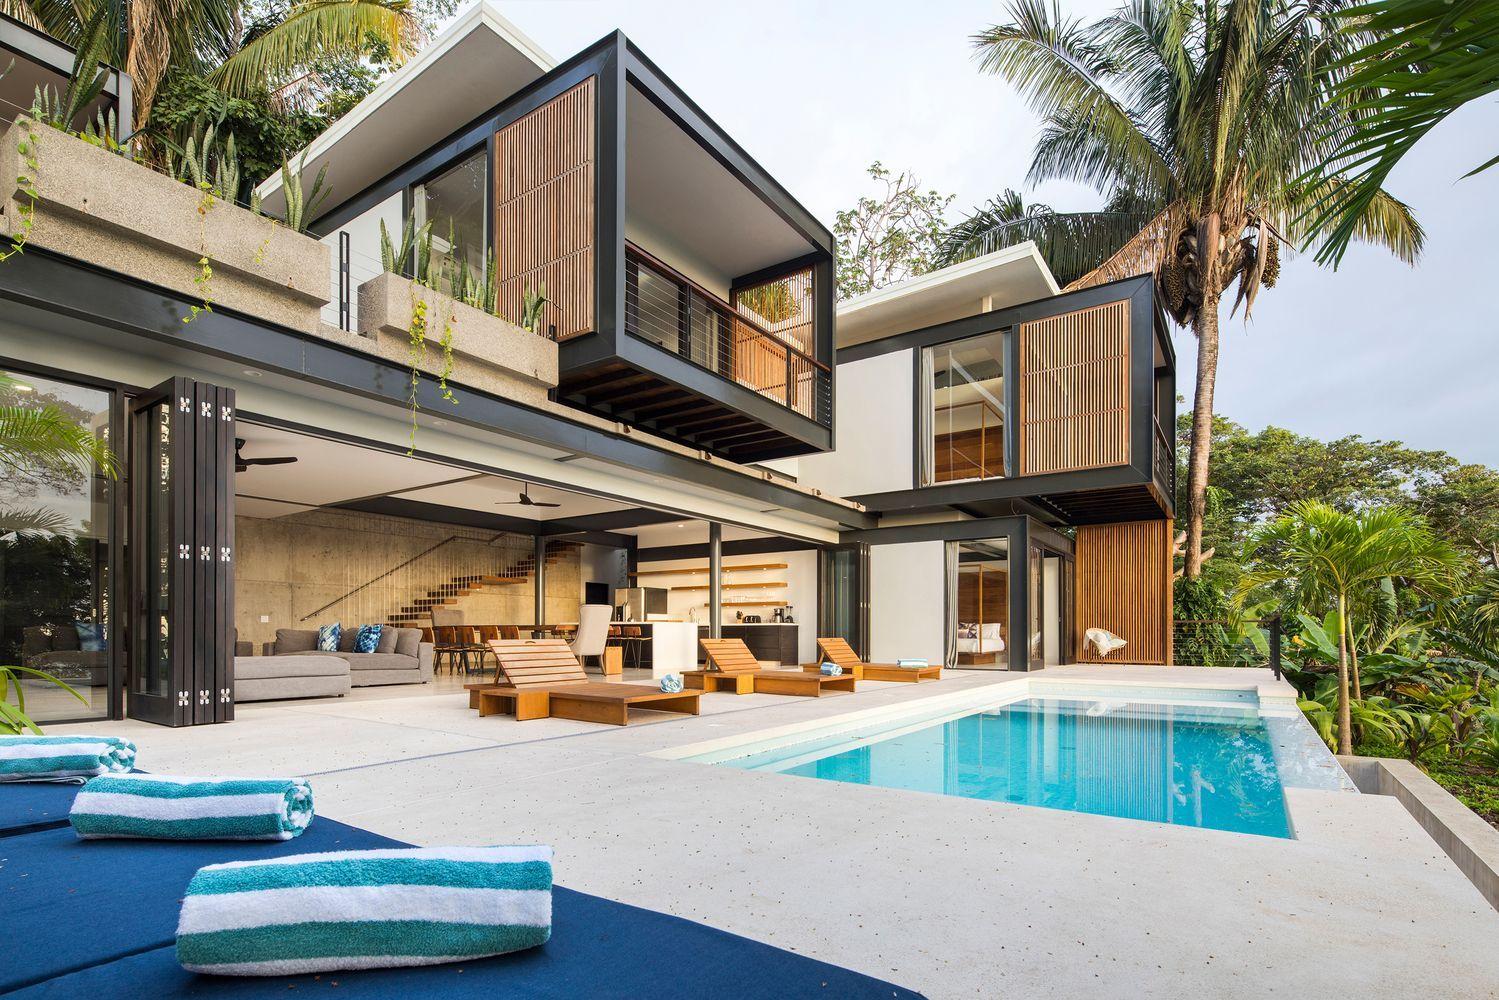 Joya Villas Studio Saxe - 11 In 2019 Places